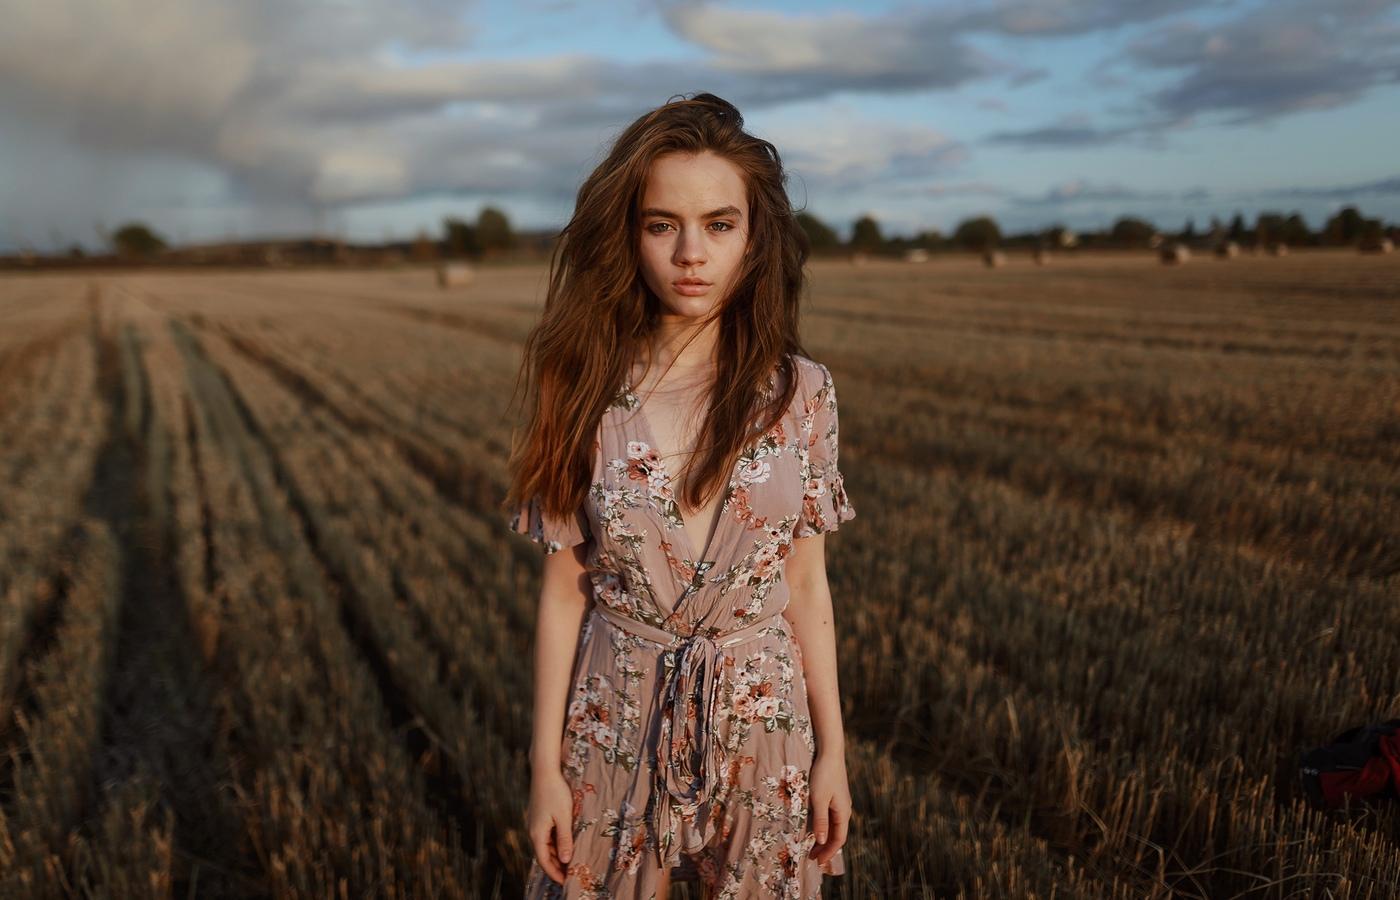 girl-field-outdoor-ea.jpg